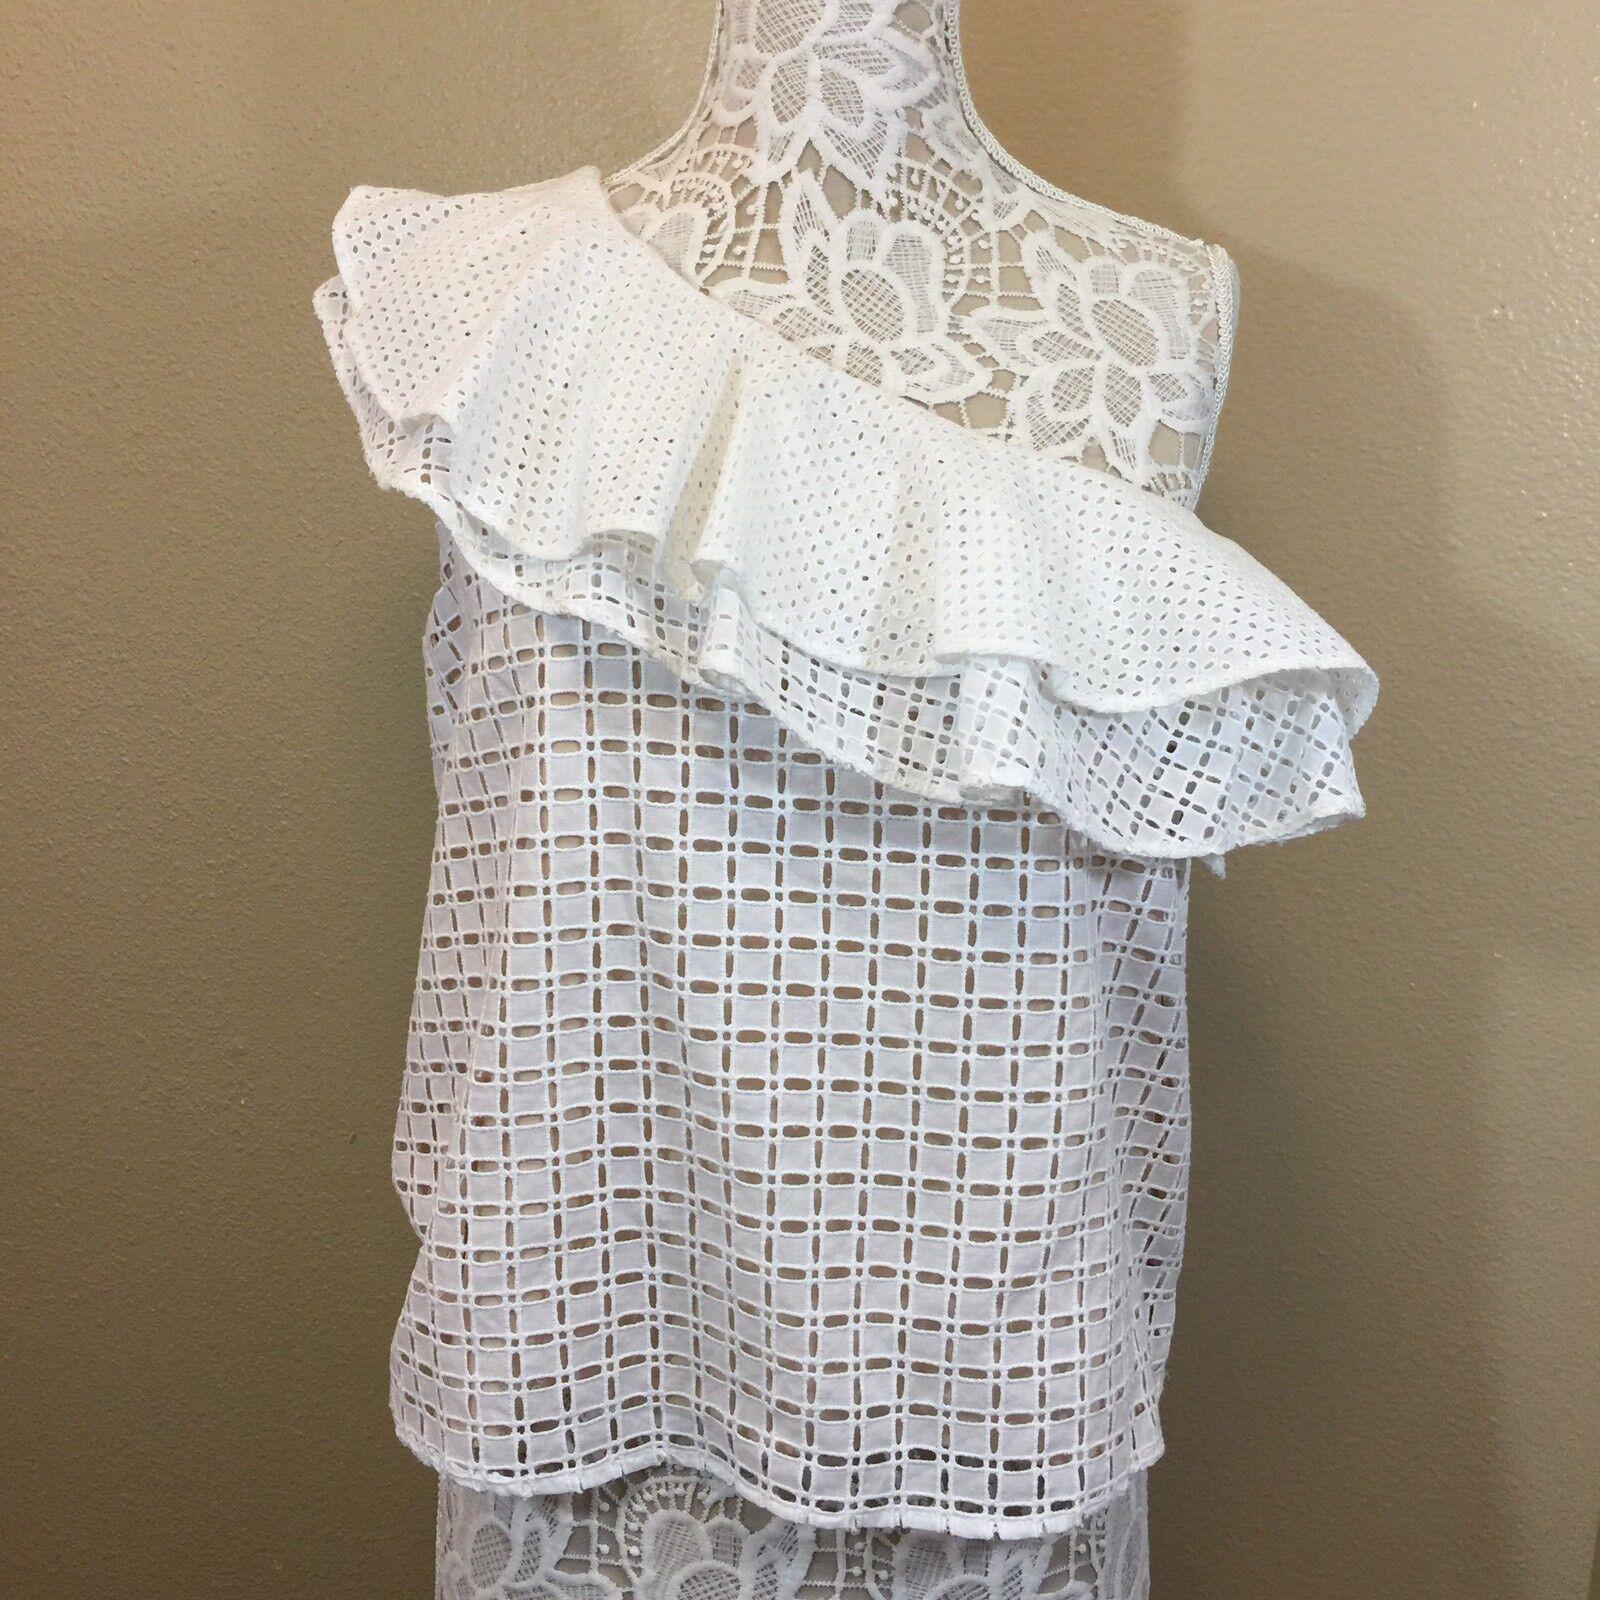 J. Crew Women Shirt Size 8 One Shoulder White Ruffle Lined in tan N161